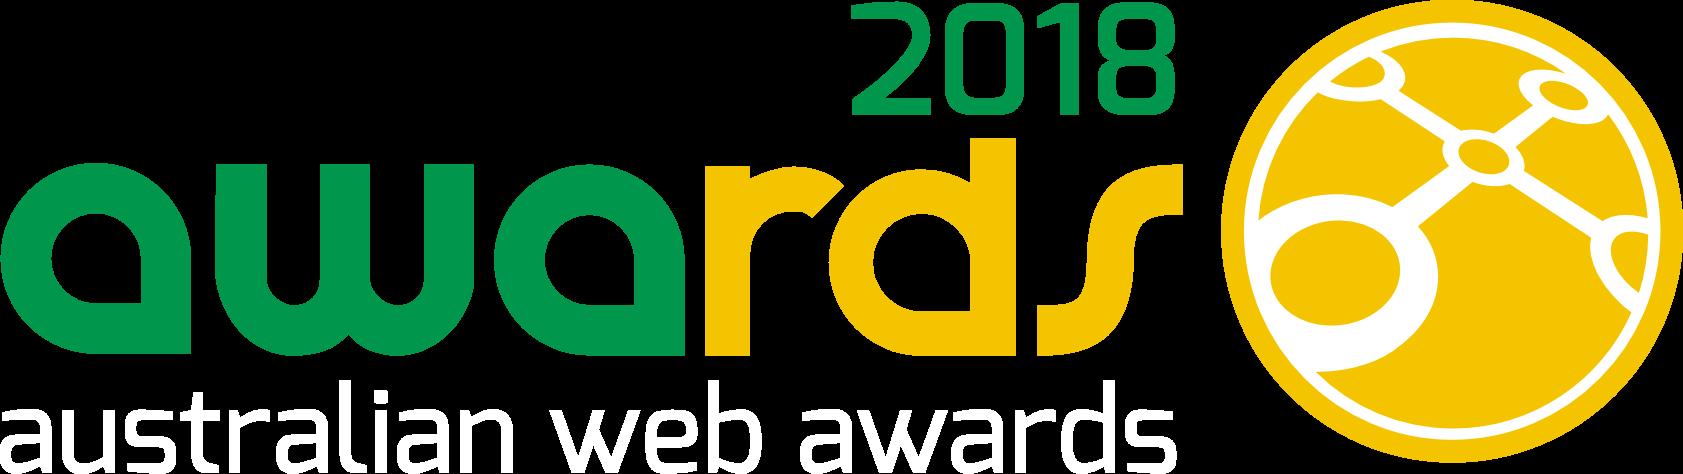 Australian Web Awards 2019.